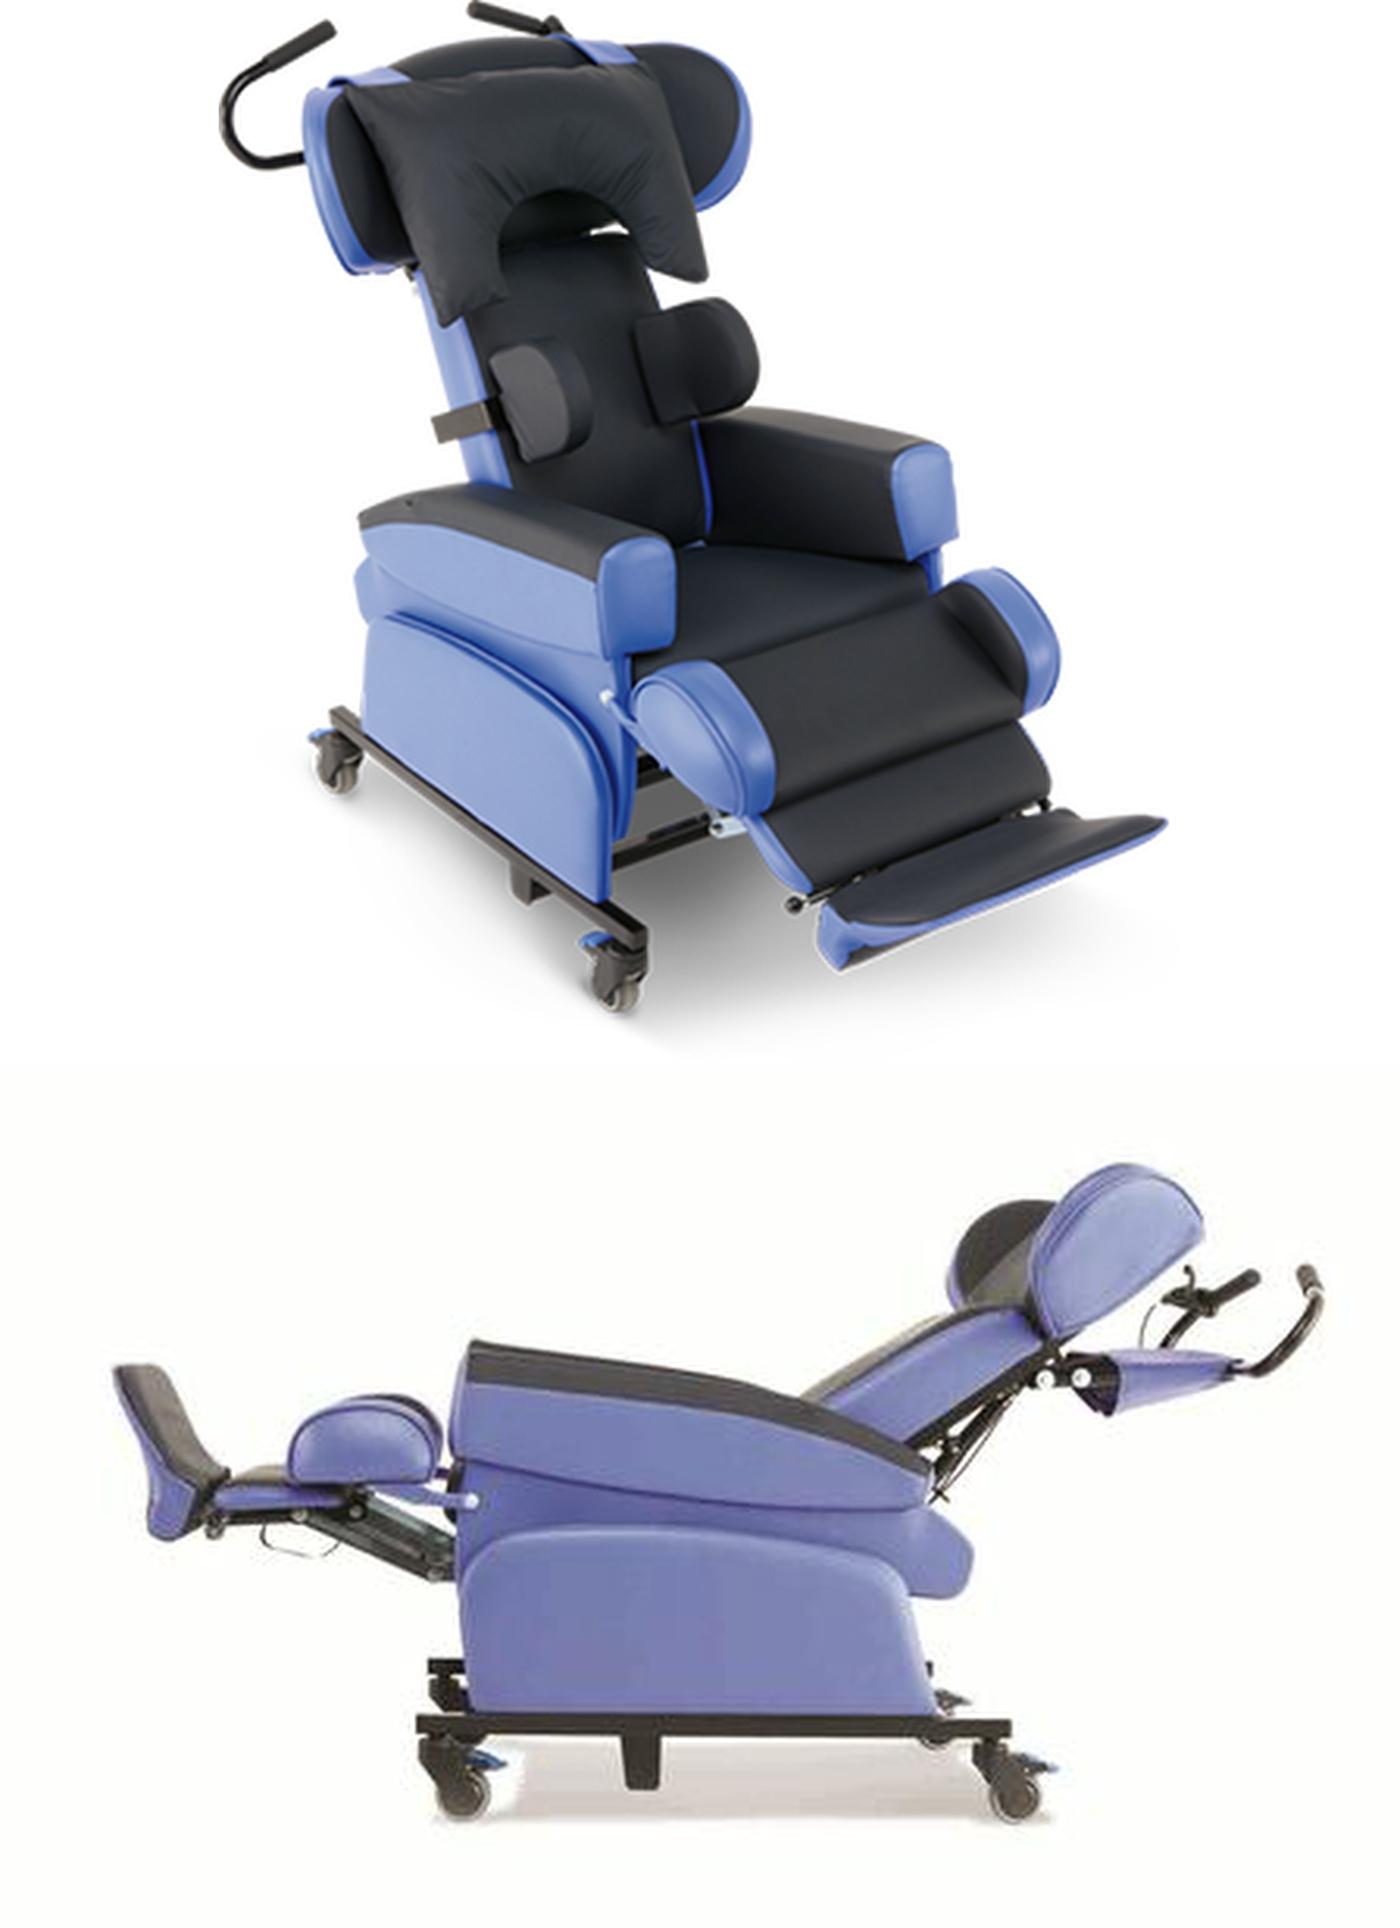 Careflex Hydroflex Midshires Mobility Group